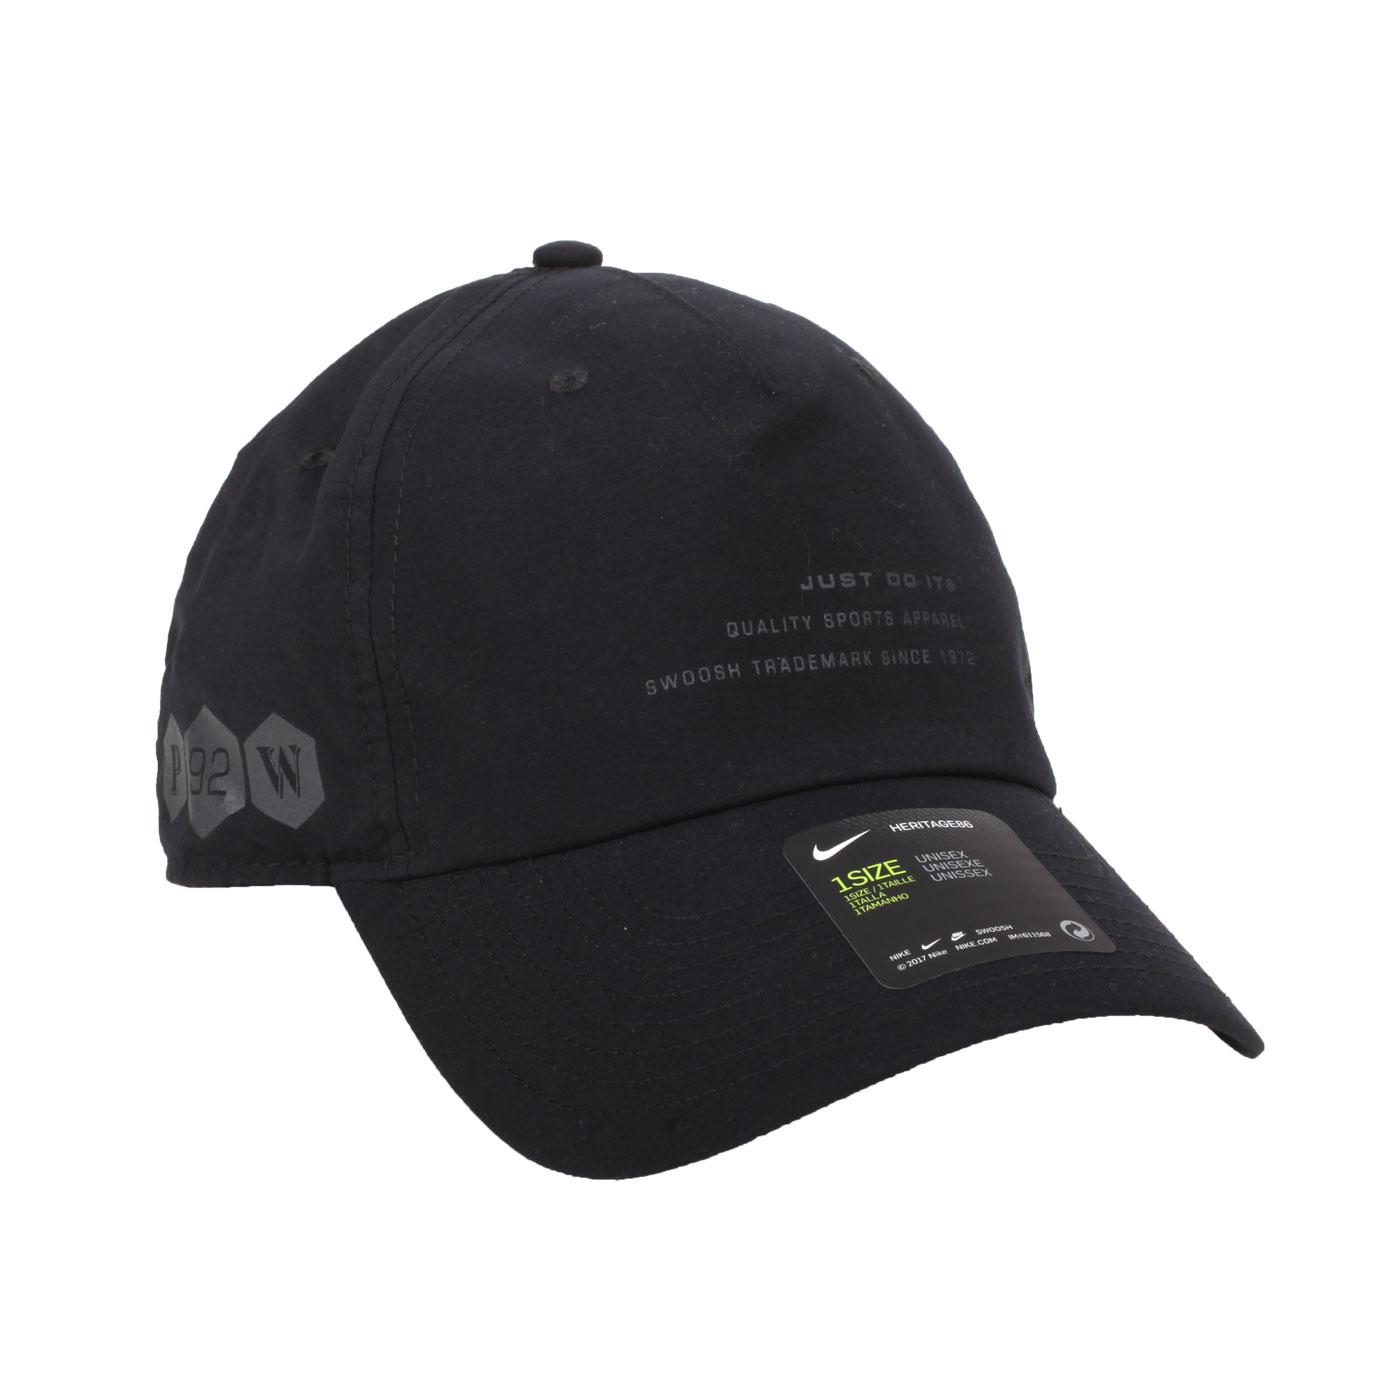 NIKE 帽子 DA1779-010 - 黑灰